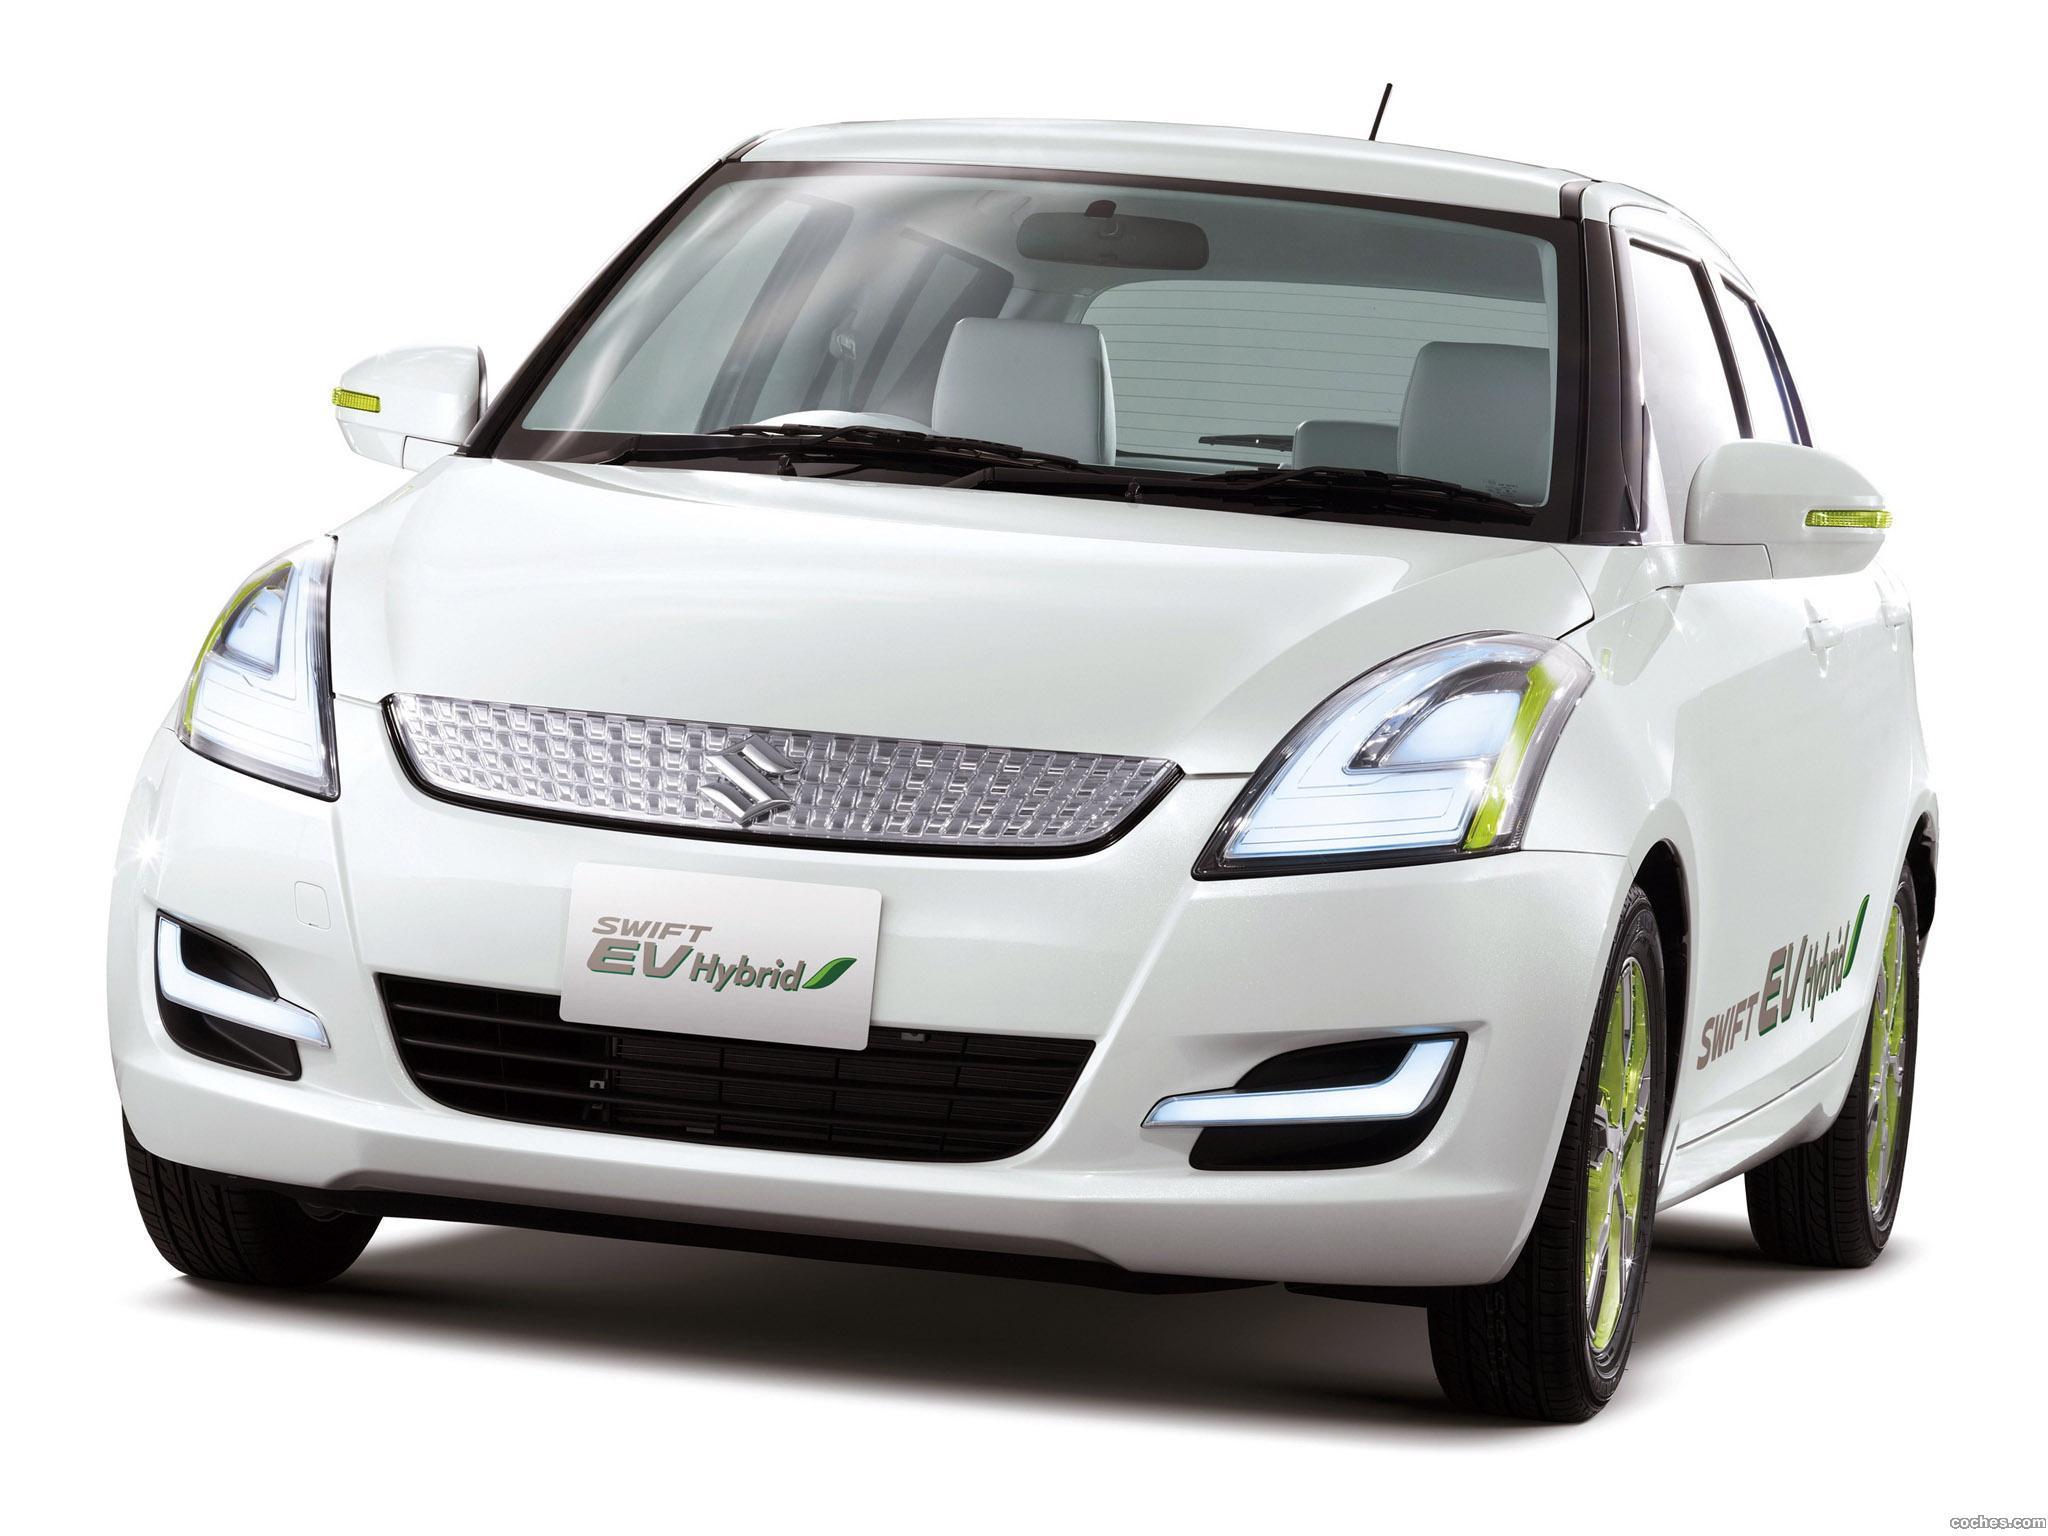 Foto 0 de Suzuki Swift EV Hybrid 2011